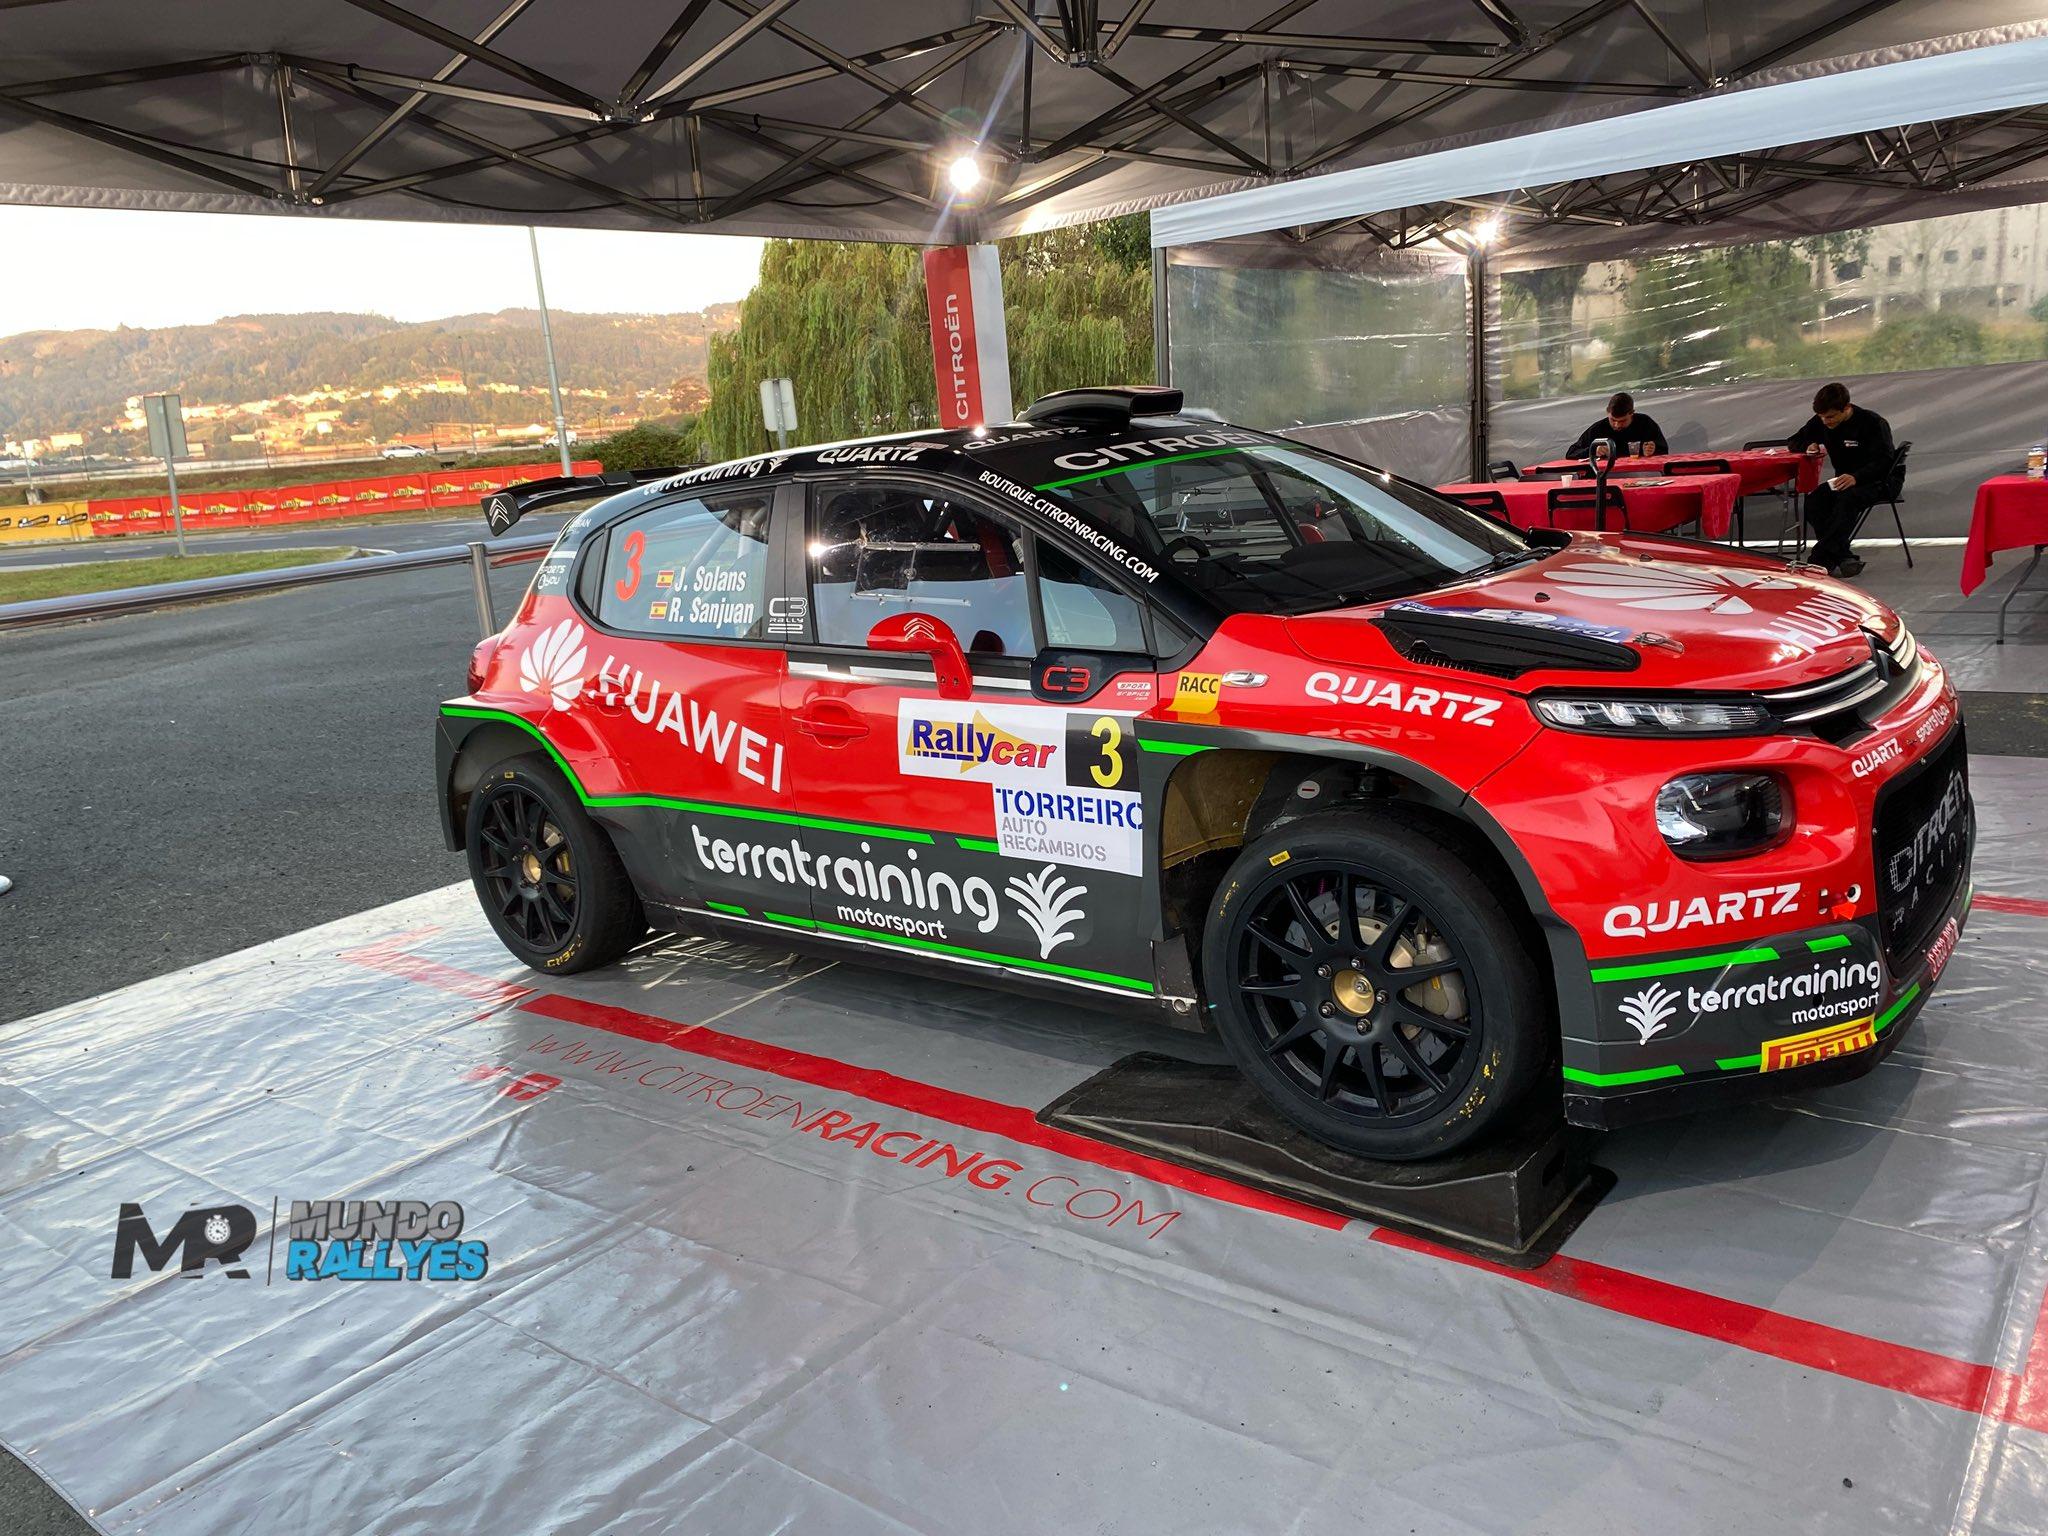 SCER + TER: 52º Rallye de Ferrol - Suzuki [20-21 Agosto] E9N5SbMXoAMx_DQ?format=jpg&name=large